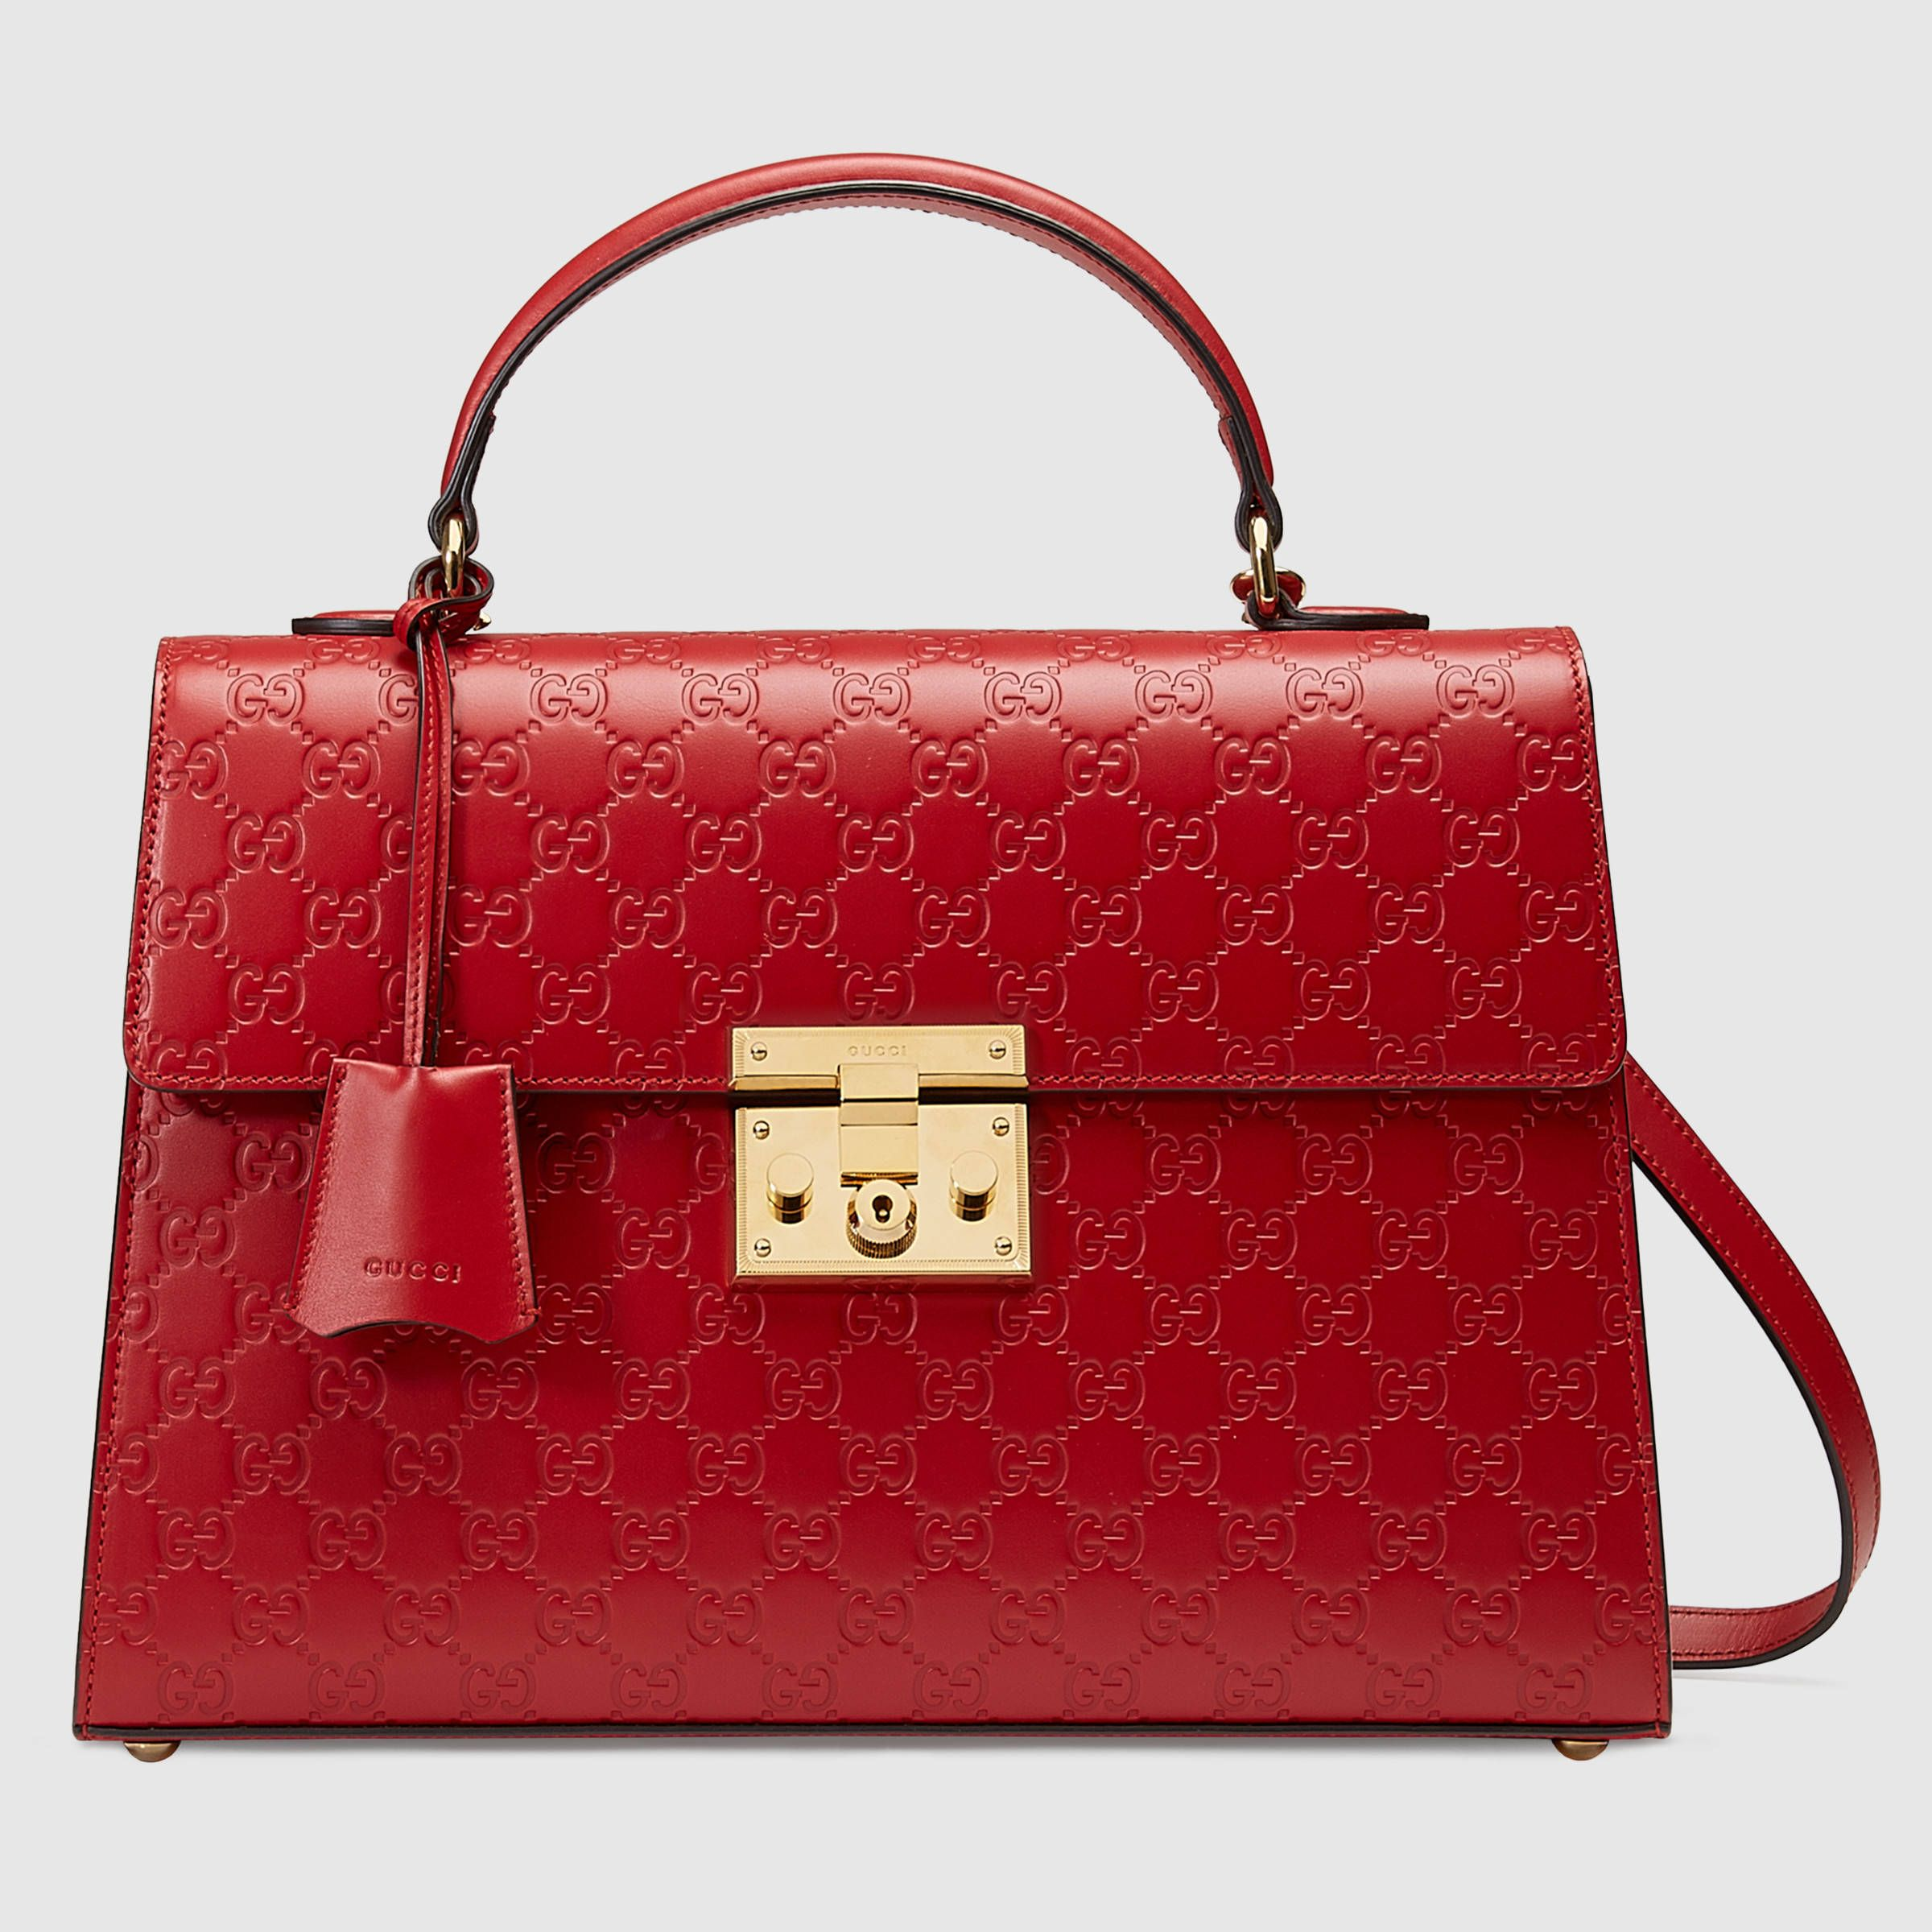 0ca42853b90 Padlock Gucci Signature top handle - Gucci Women s Top Handles   Boston  Bags 428208CWC1G6433